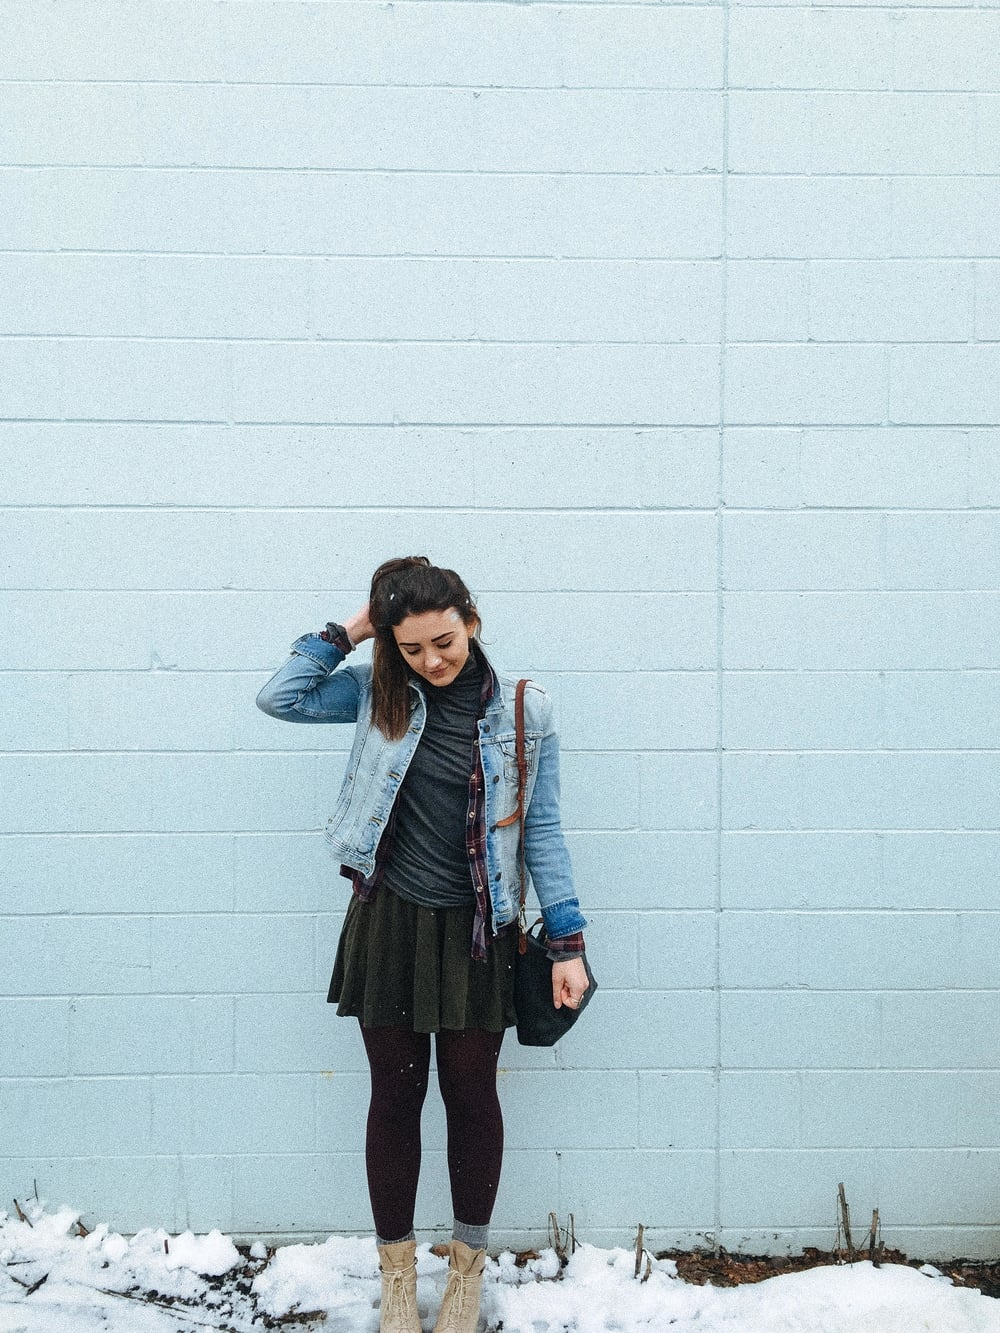 Brandy Melville  Jean Jacket  (similar)  |  Brandy Melville  Flannel  | La Seniorita Jolie Turtleneck | Brandy Melville  Skirt  (similar)| Bullboxer  Boots  | Madewell  Mini Transport Crossbody